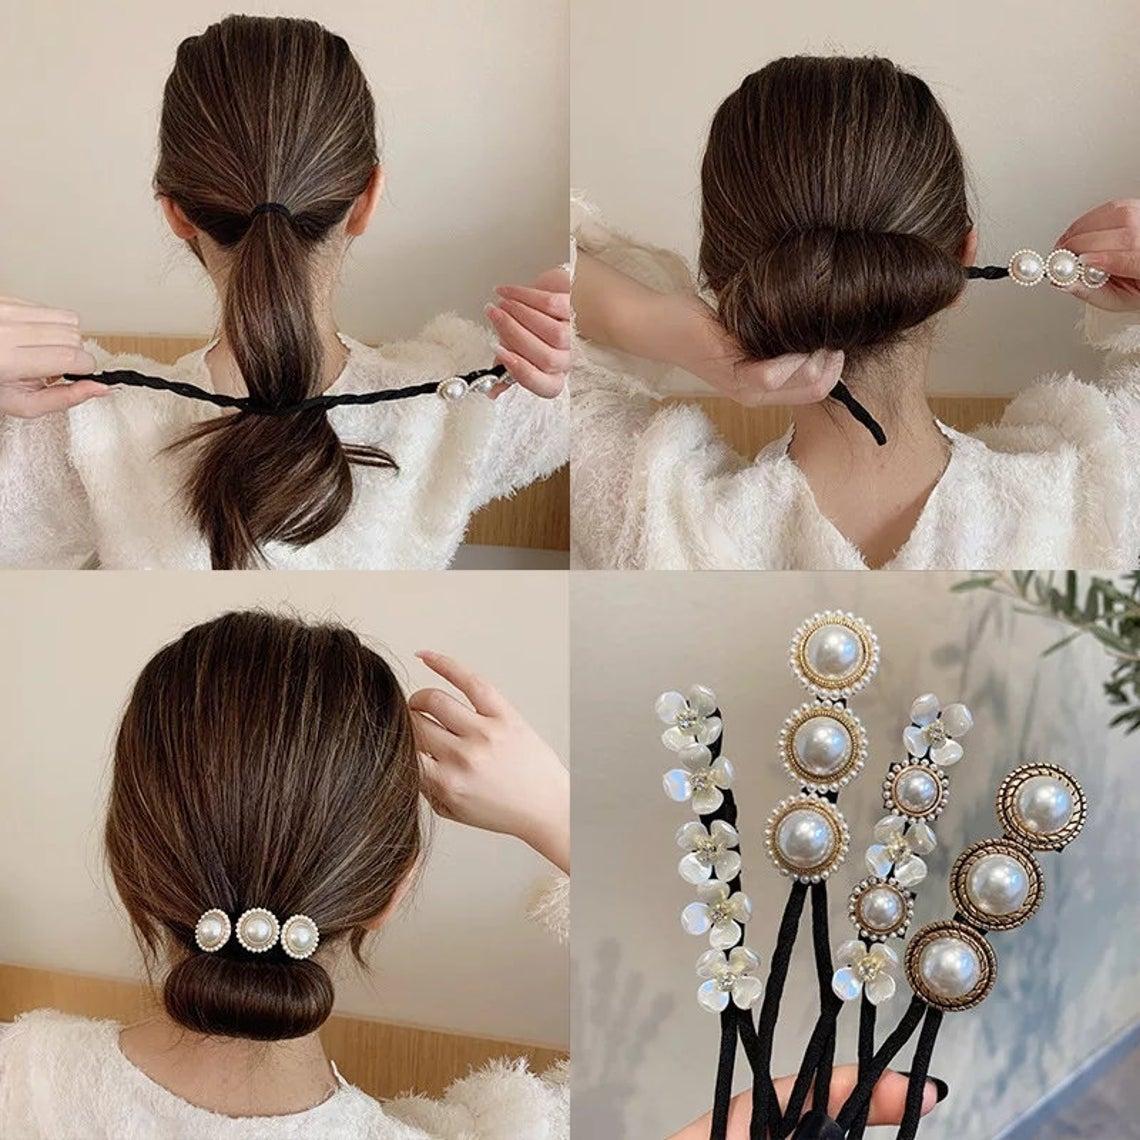 Hair Bun Maker Tool With Faux Pearl Stone Flowers For Women Girls Ponytail Low Bun Donut Hair Accessories Braider Twist Headwear Jewellery